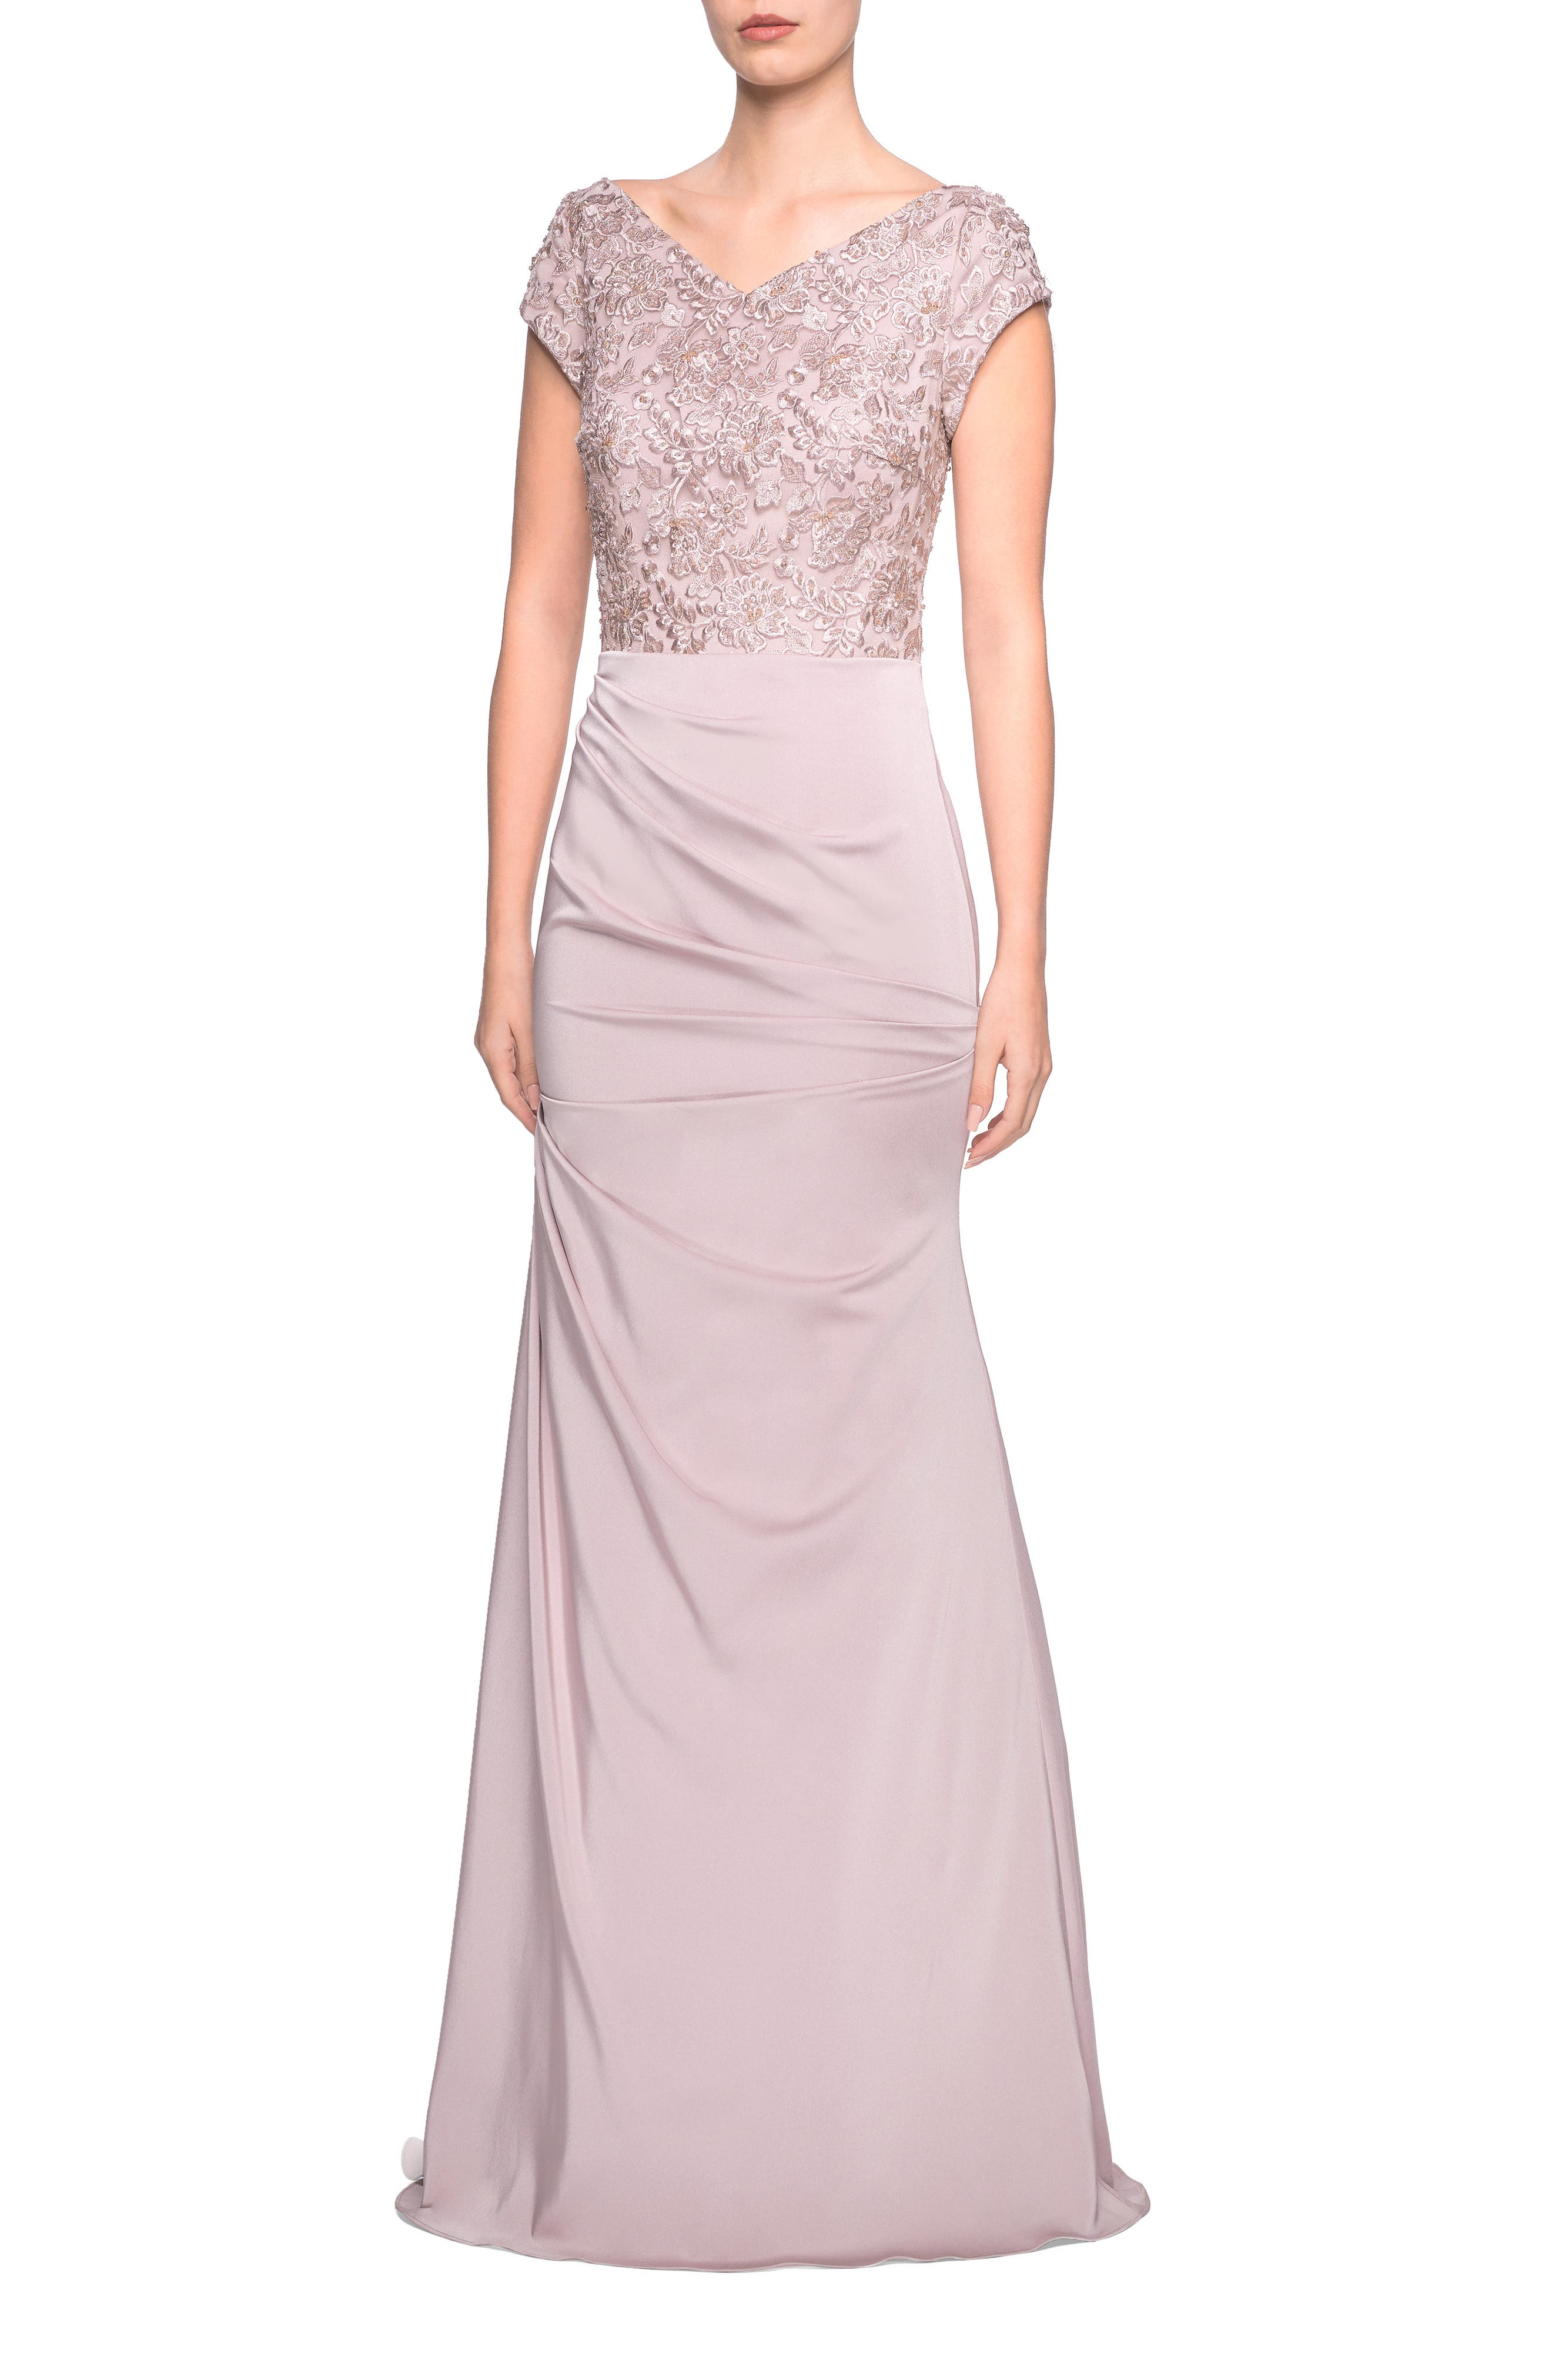 La Femme Embroidered Bodice Satin Evening Dress, 8 (similar to 18W-20W) - Beige